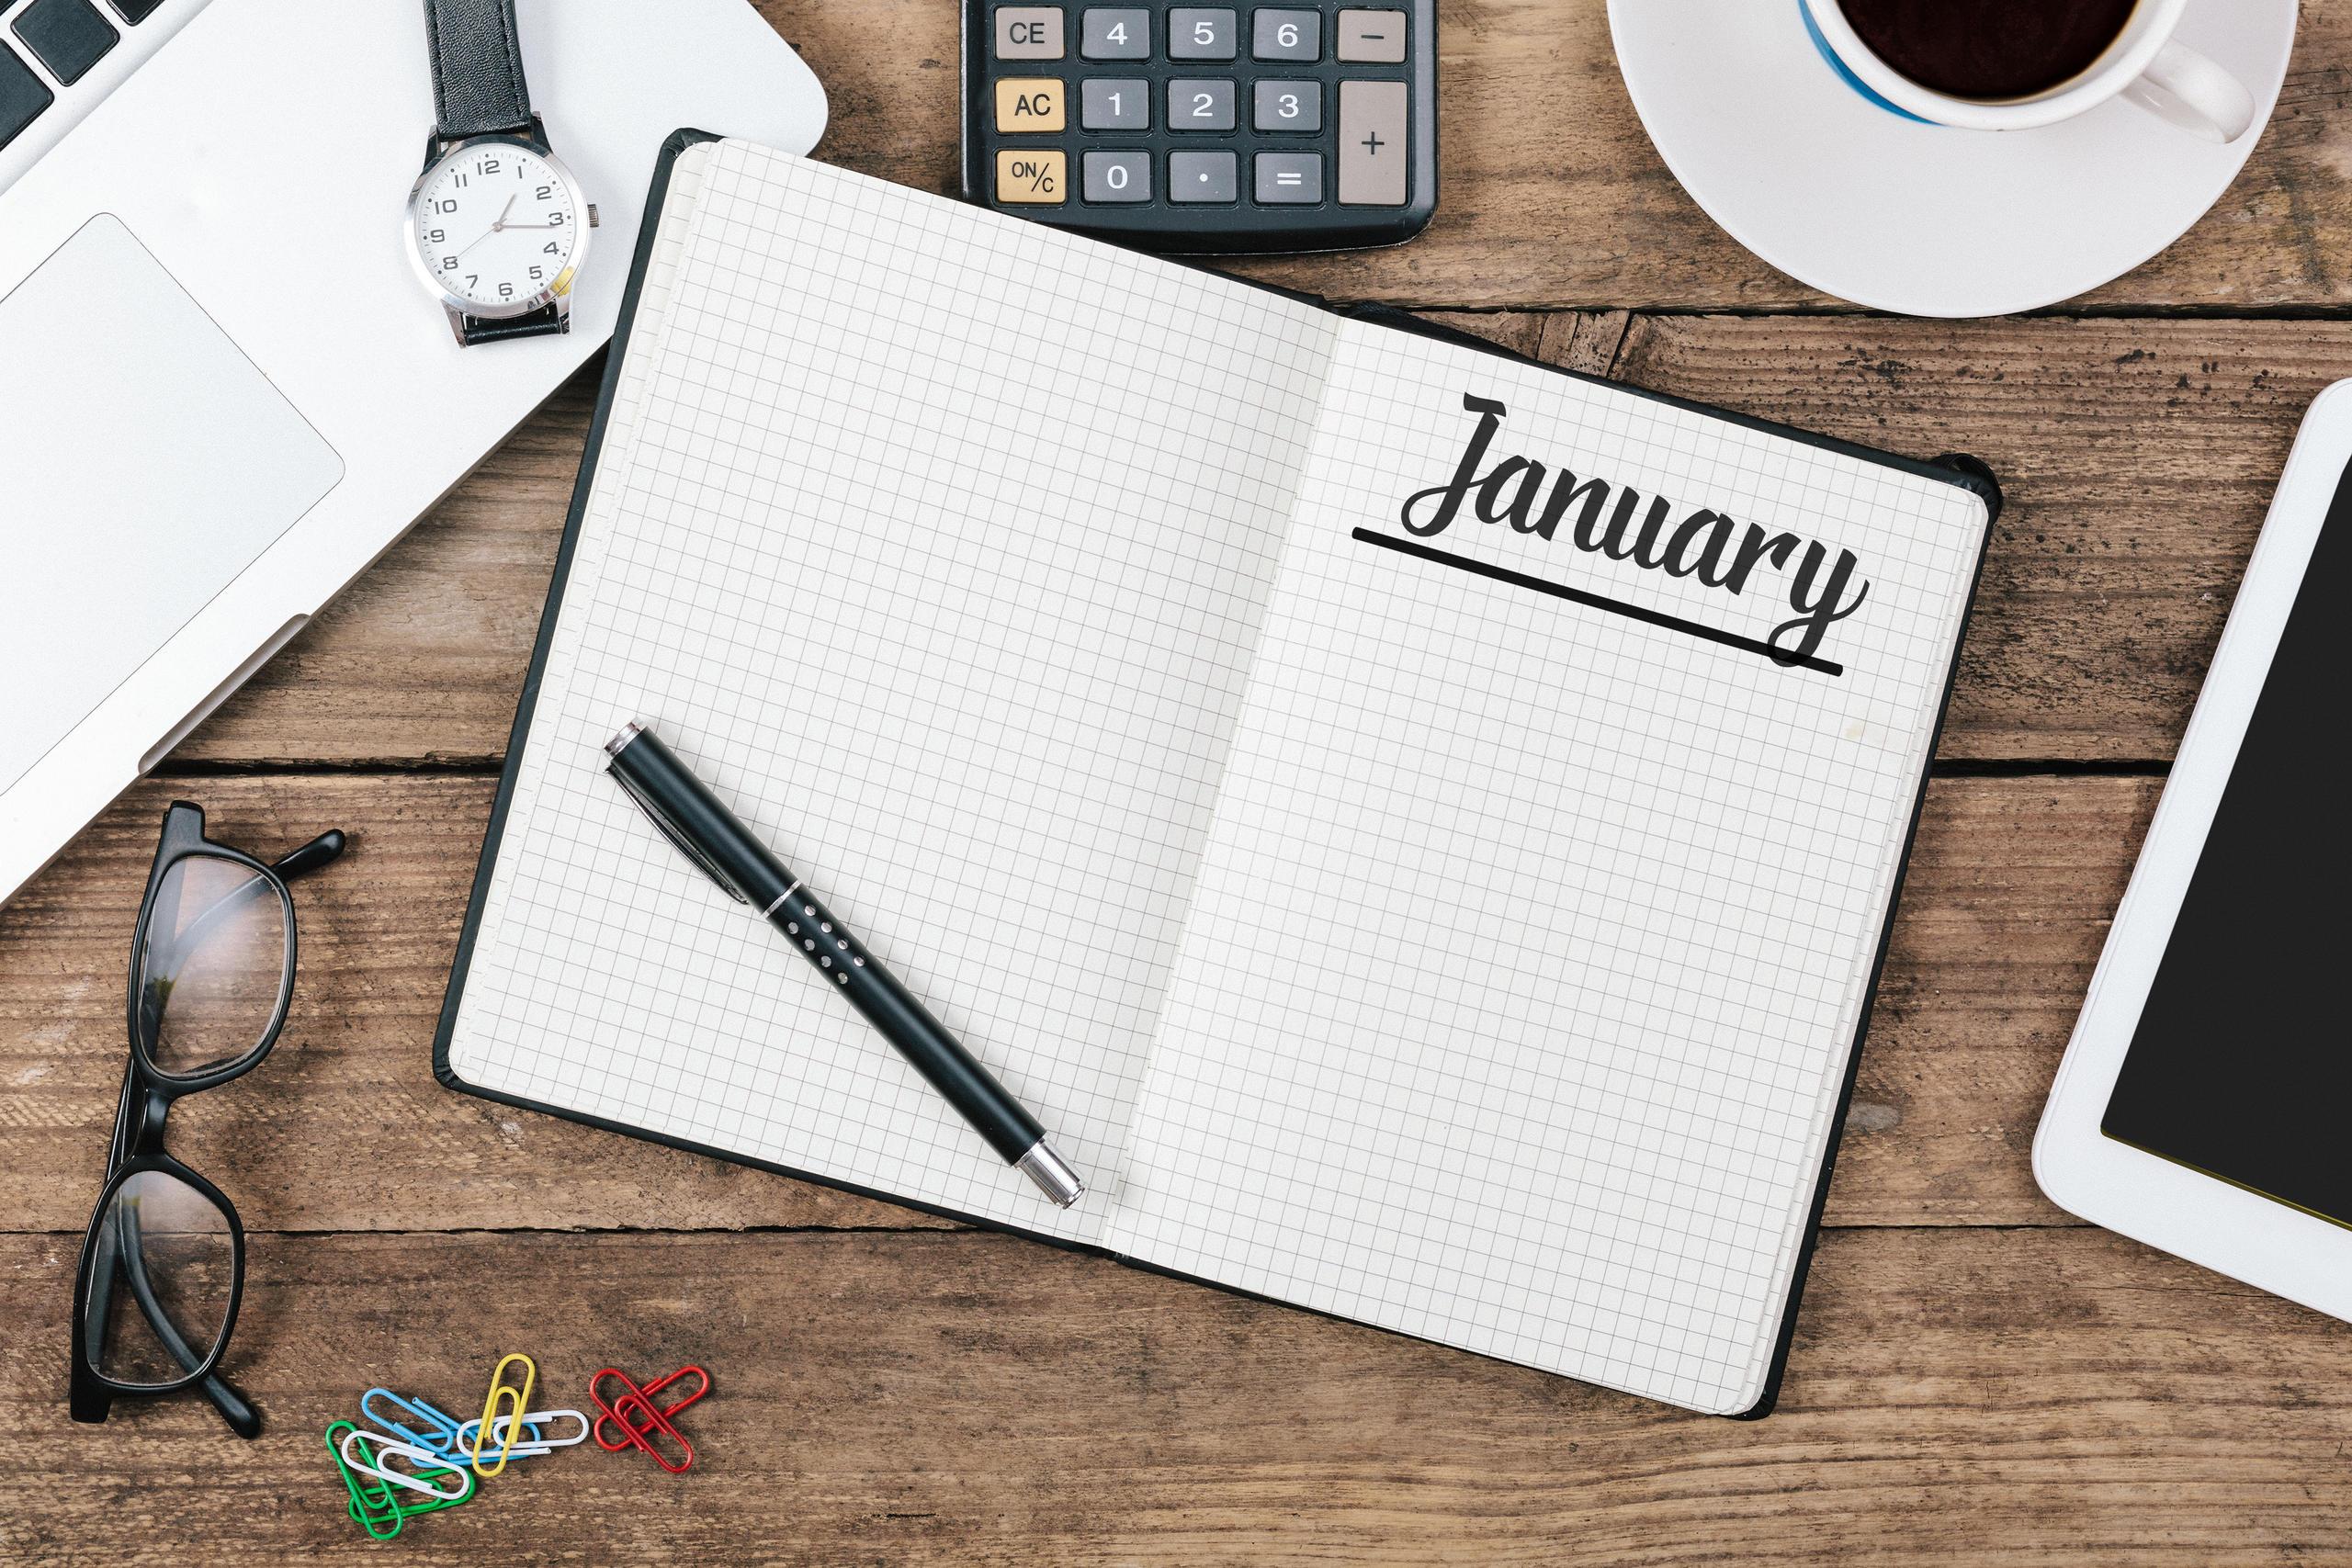 Daily Horoscope January 2nd 2019 | Photo: © MichaelJBerlin - stock.adobe.com